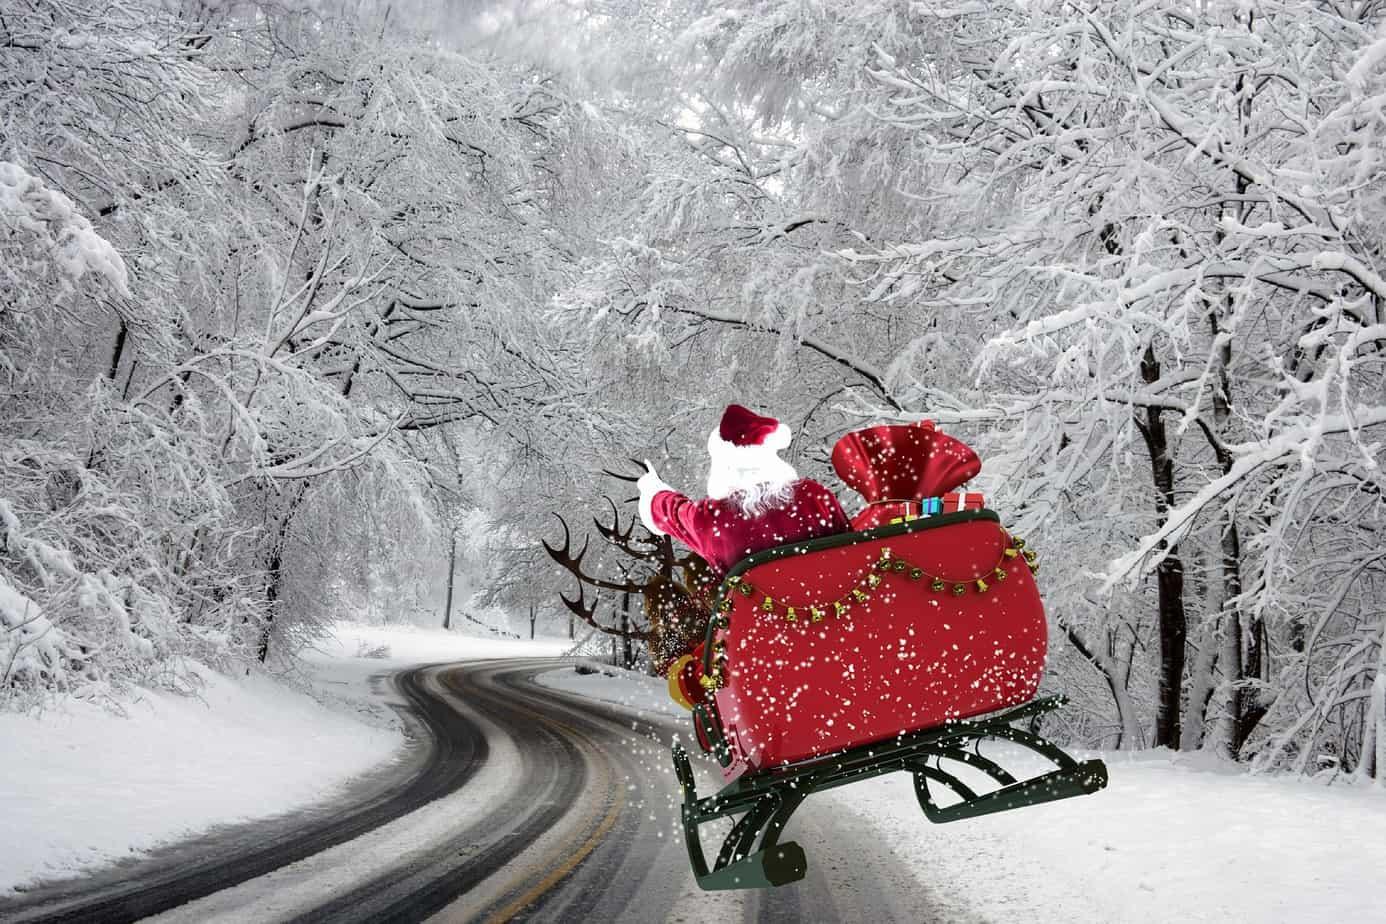 Winterlandschaft, Nikolaus, Schlitten, Schnee, Frohe Weihnachten, Marry Christmas